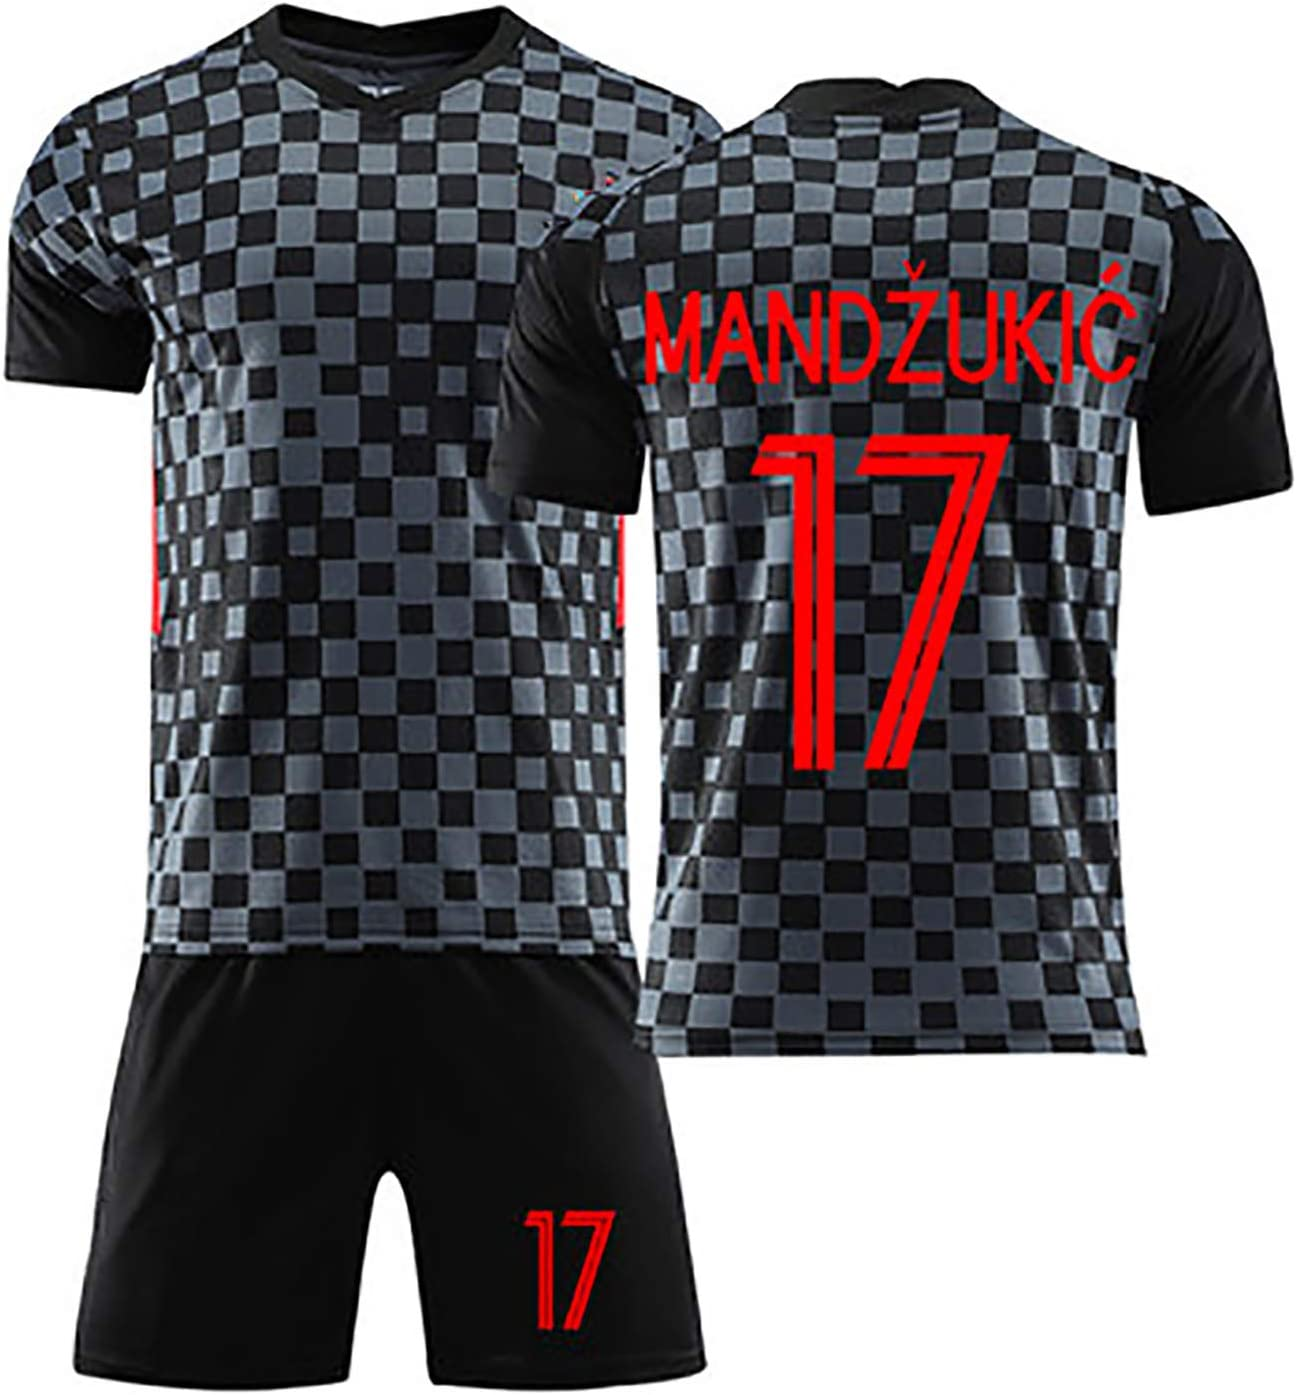 for Modric 10 Rakitic 7 Perisic 4 Kramaric 9 Mandzukic 17 2020 Away Summer Football Uniform Set,Can Be Washed Repeatedly NO.17-XL Mens Football Jersey